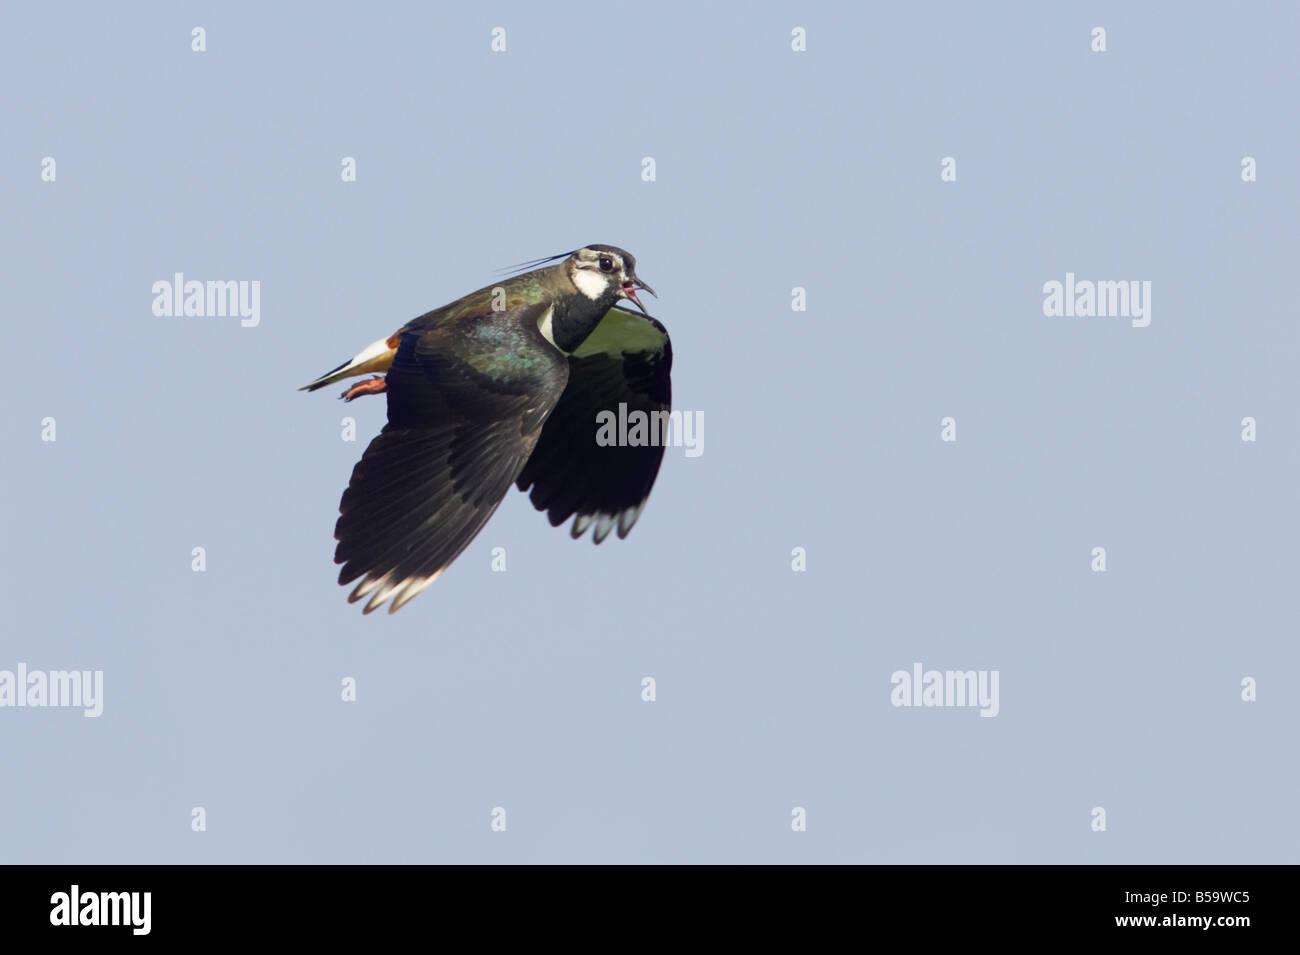 Lapwing Calling in flight Venellus venellus South Uist Outer hebrides Scotland UK BI016757 - Stock Image